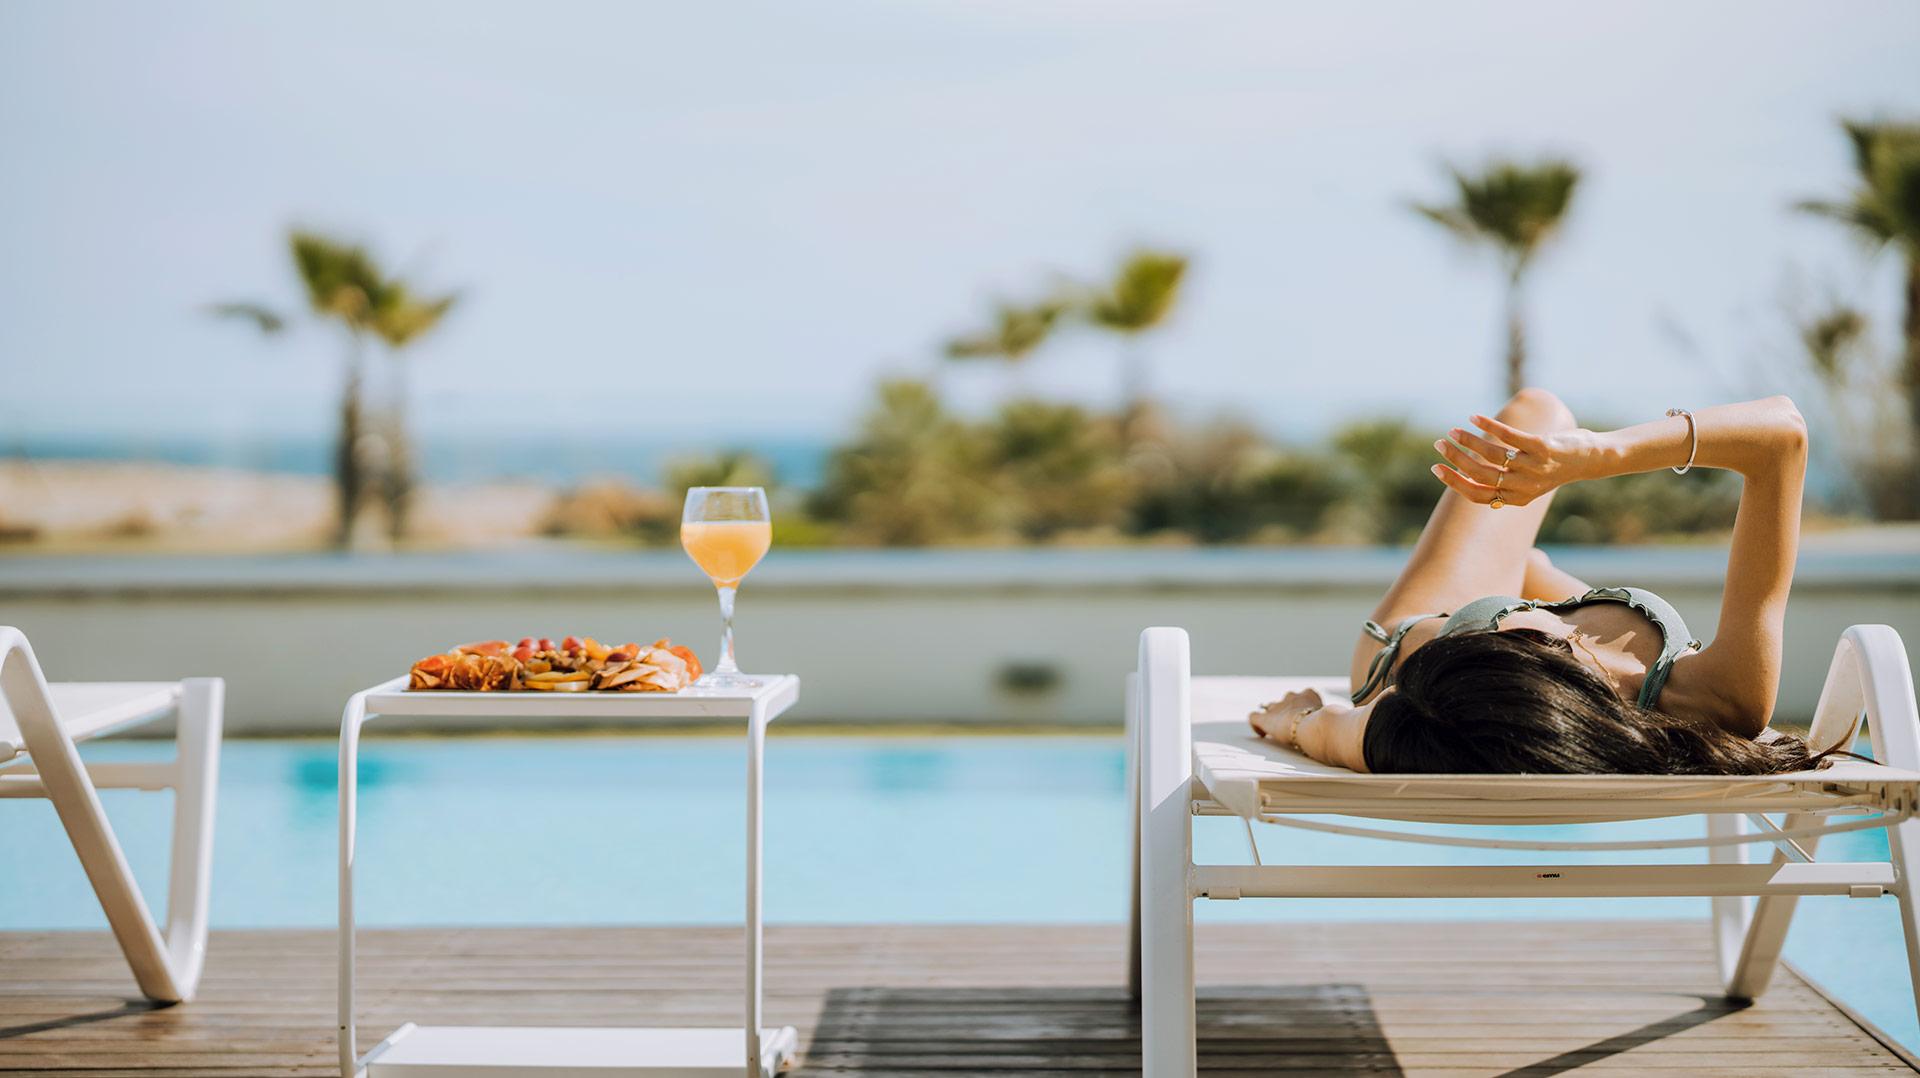 relaxing pool vivo mare ayia napa